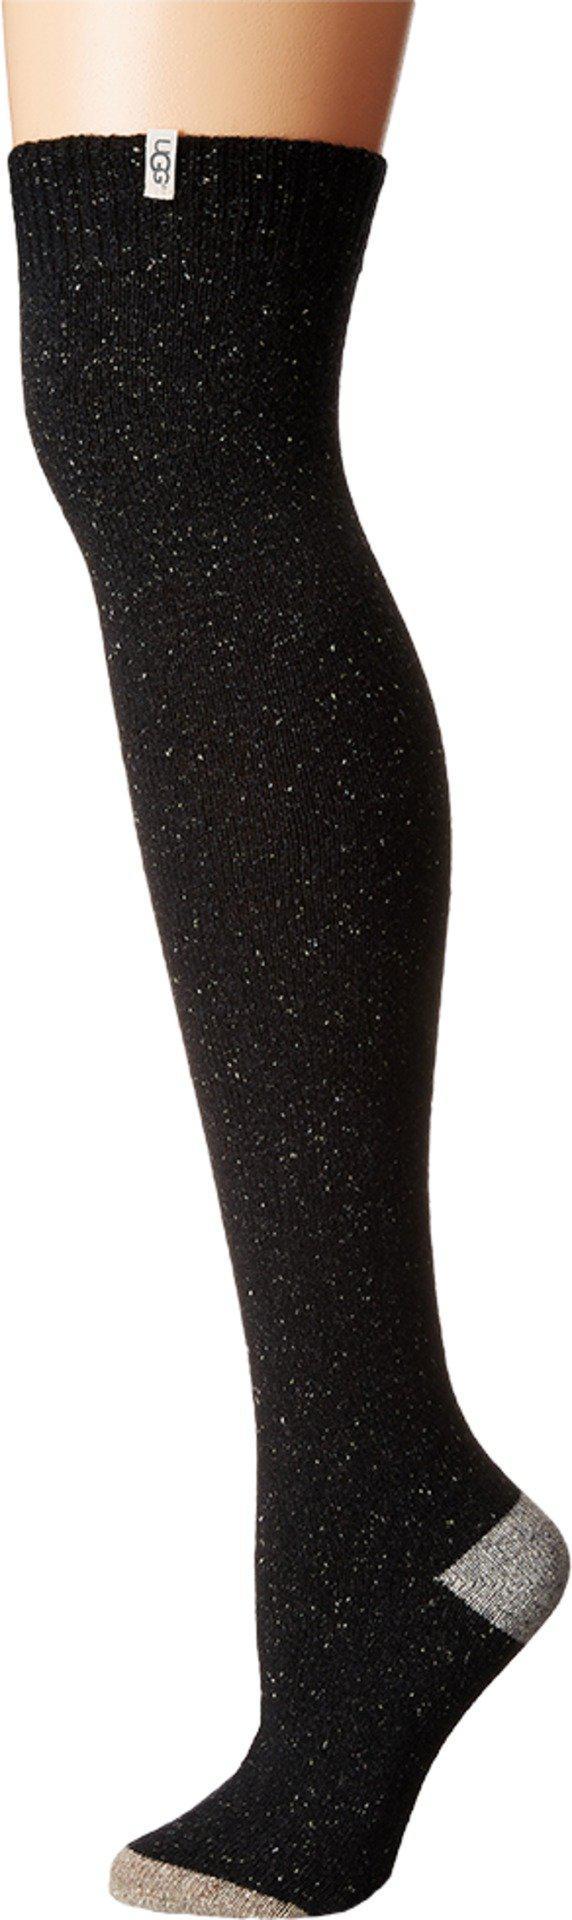 09be1f025 Lyst - UGG Color Block Rib Over The Knee Socks in Black